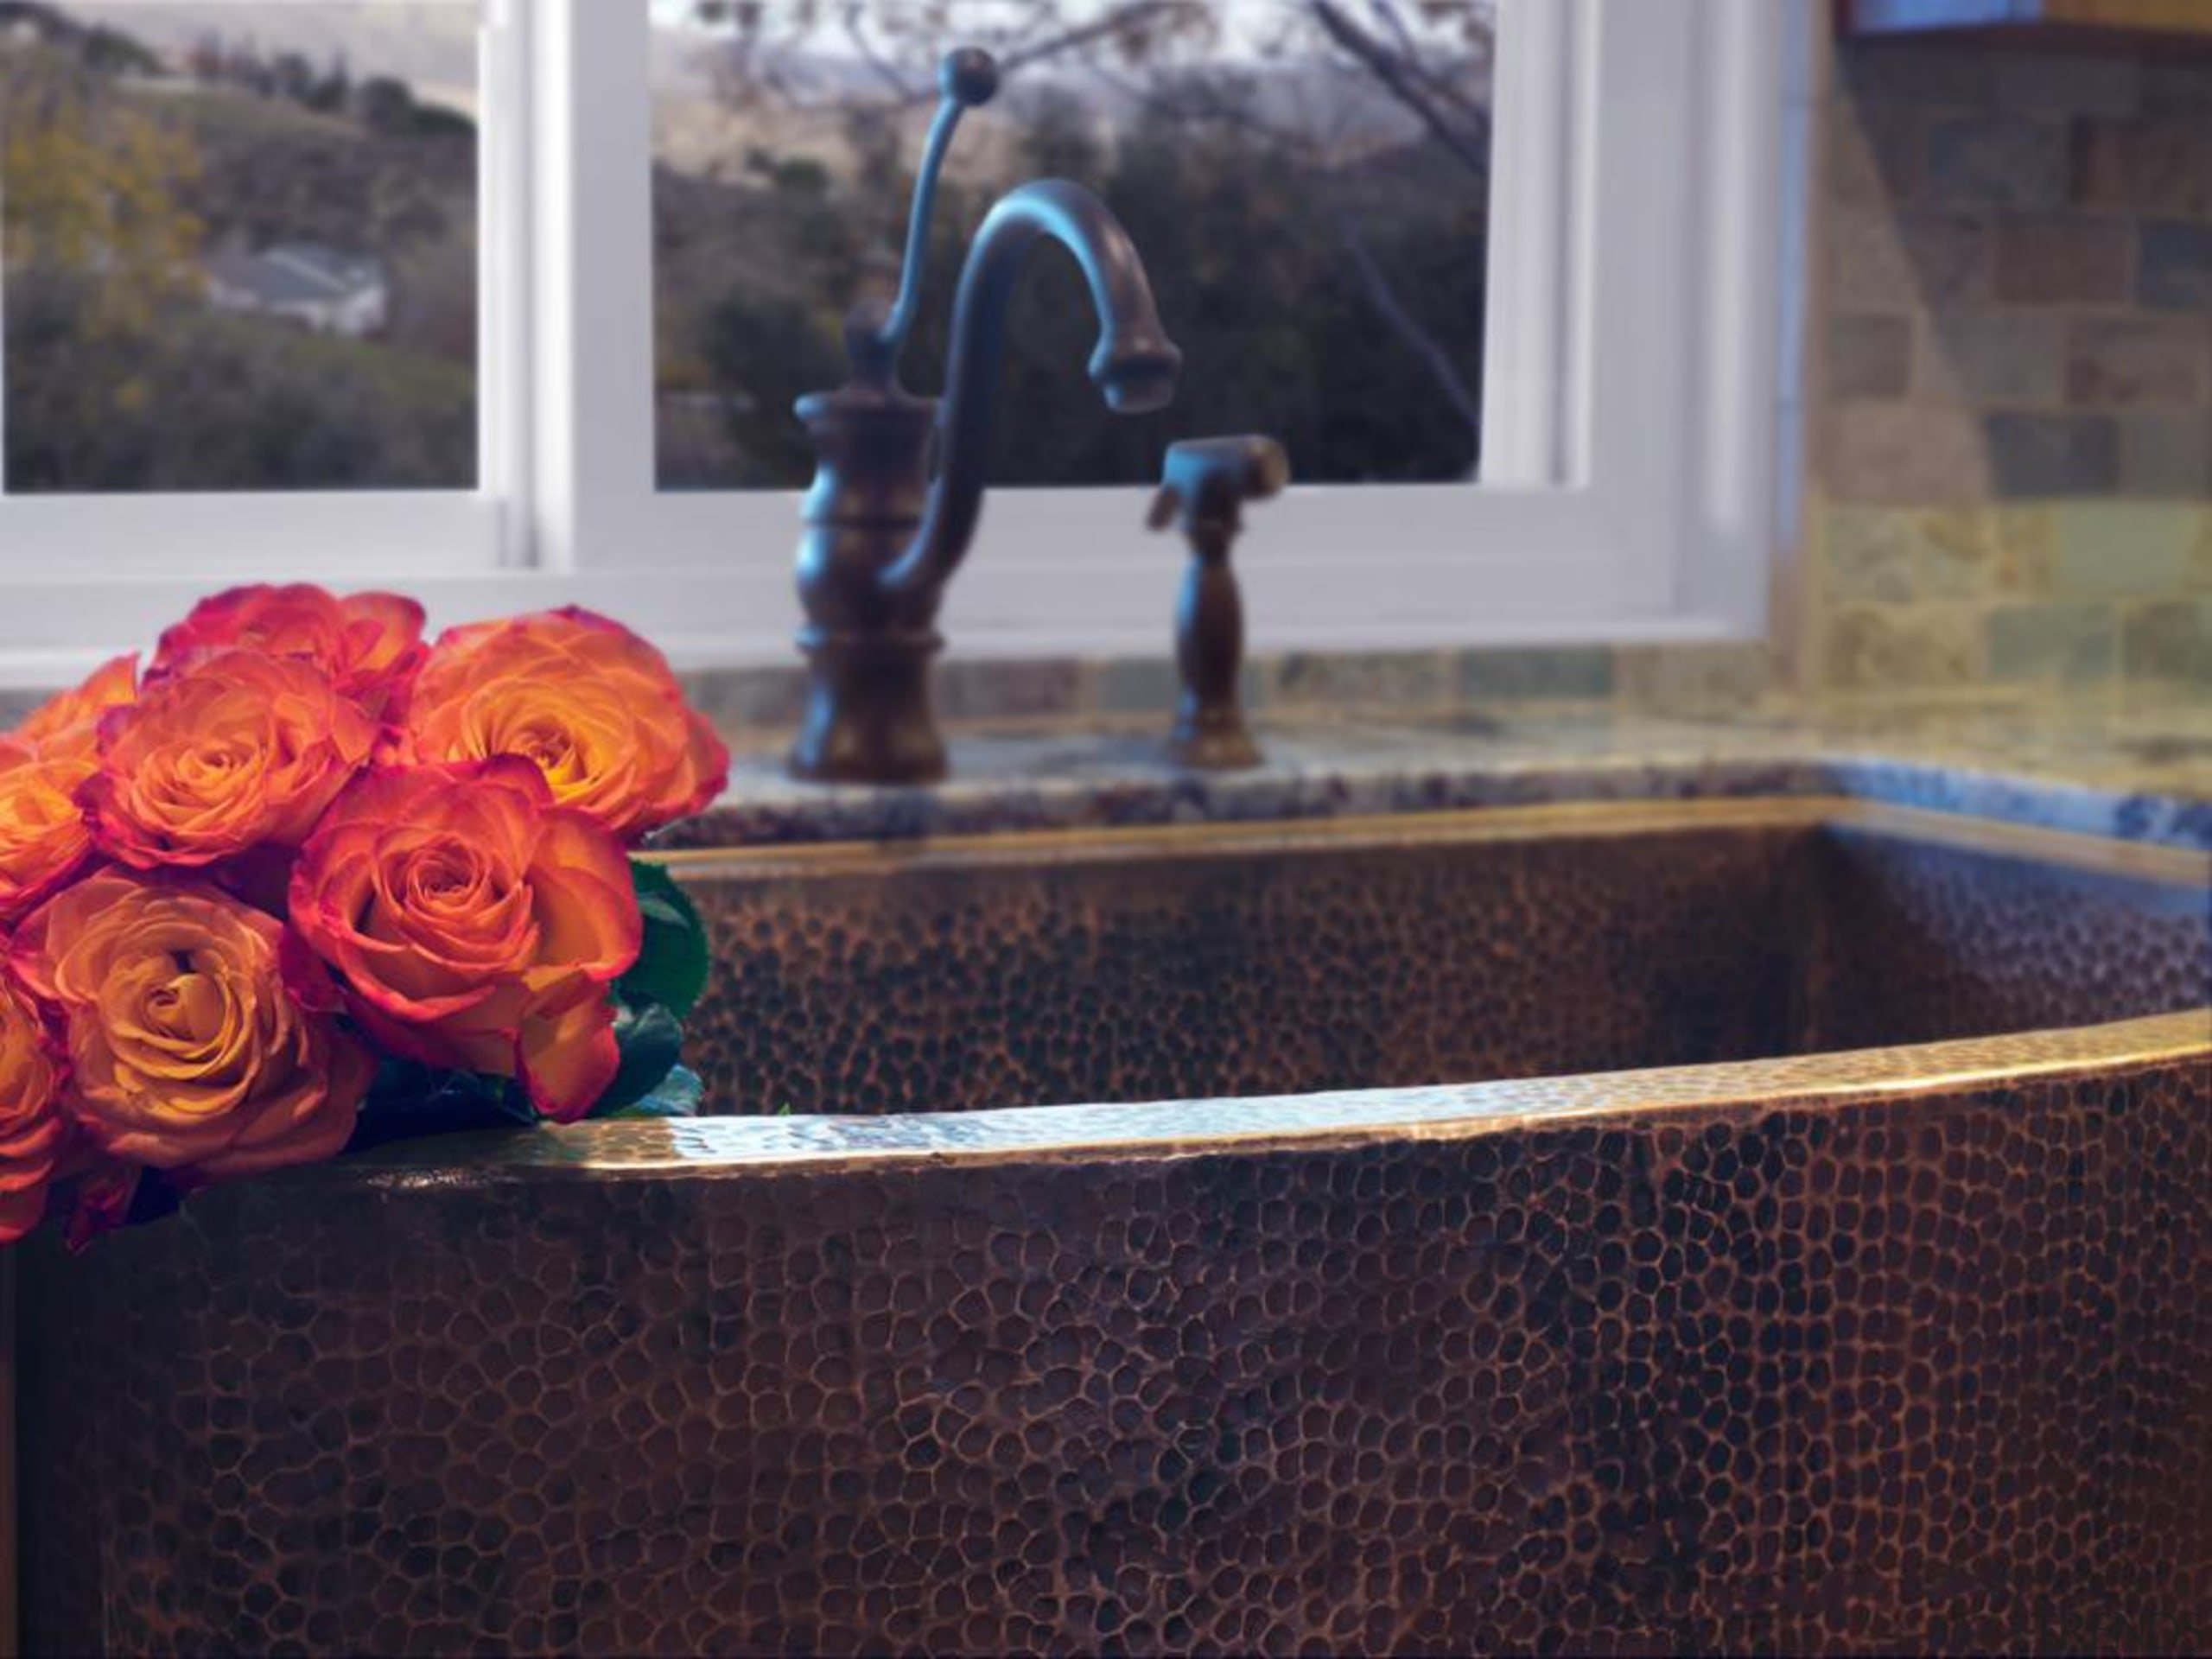 Hammered copper farm sink. - Hammered copper farm flooring, flower, plant, wood, yellow, black, gray